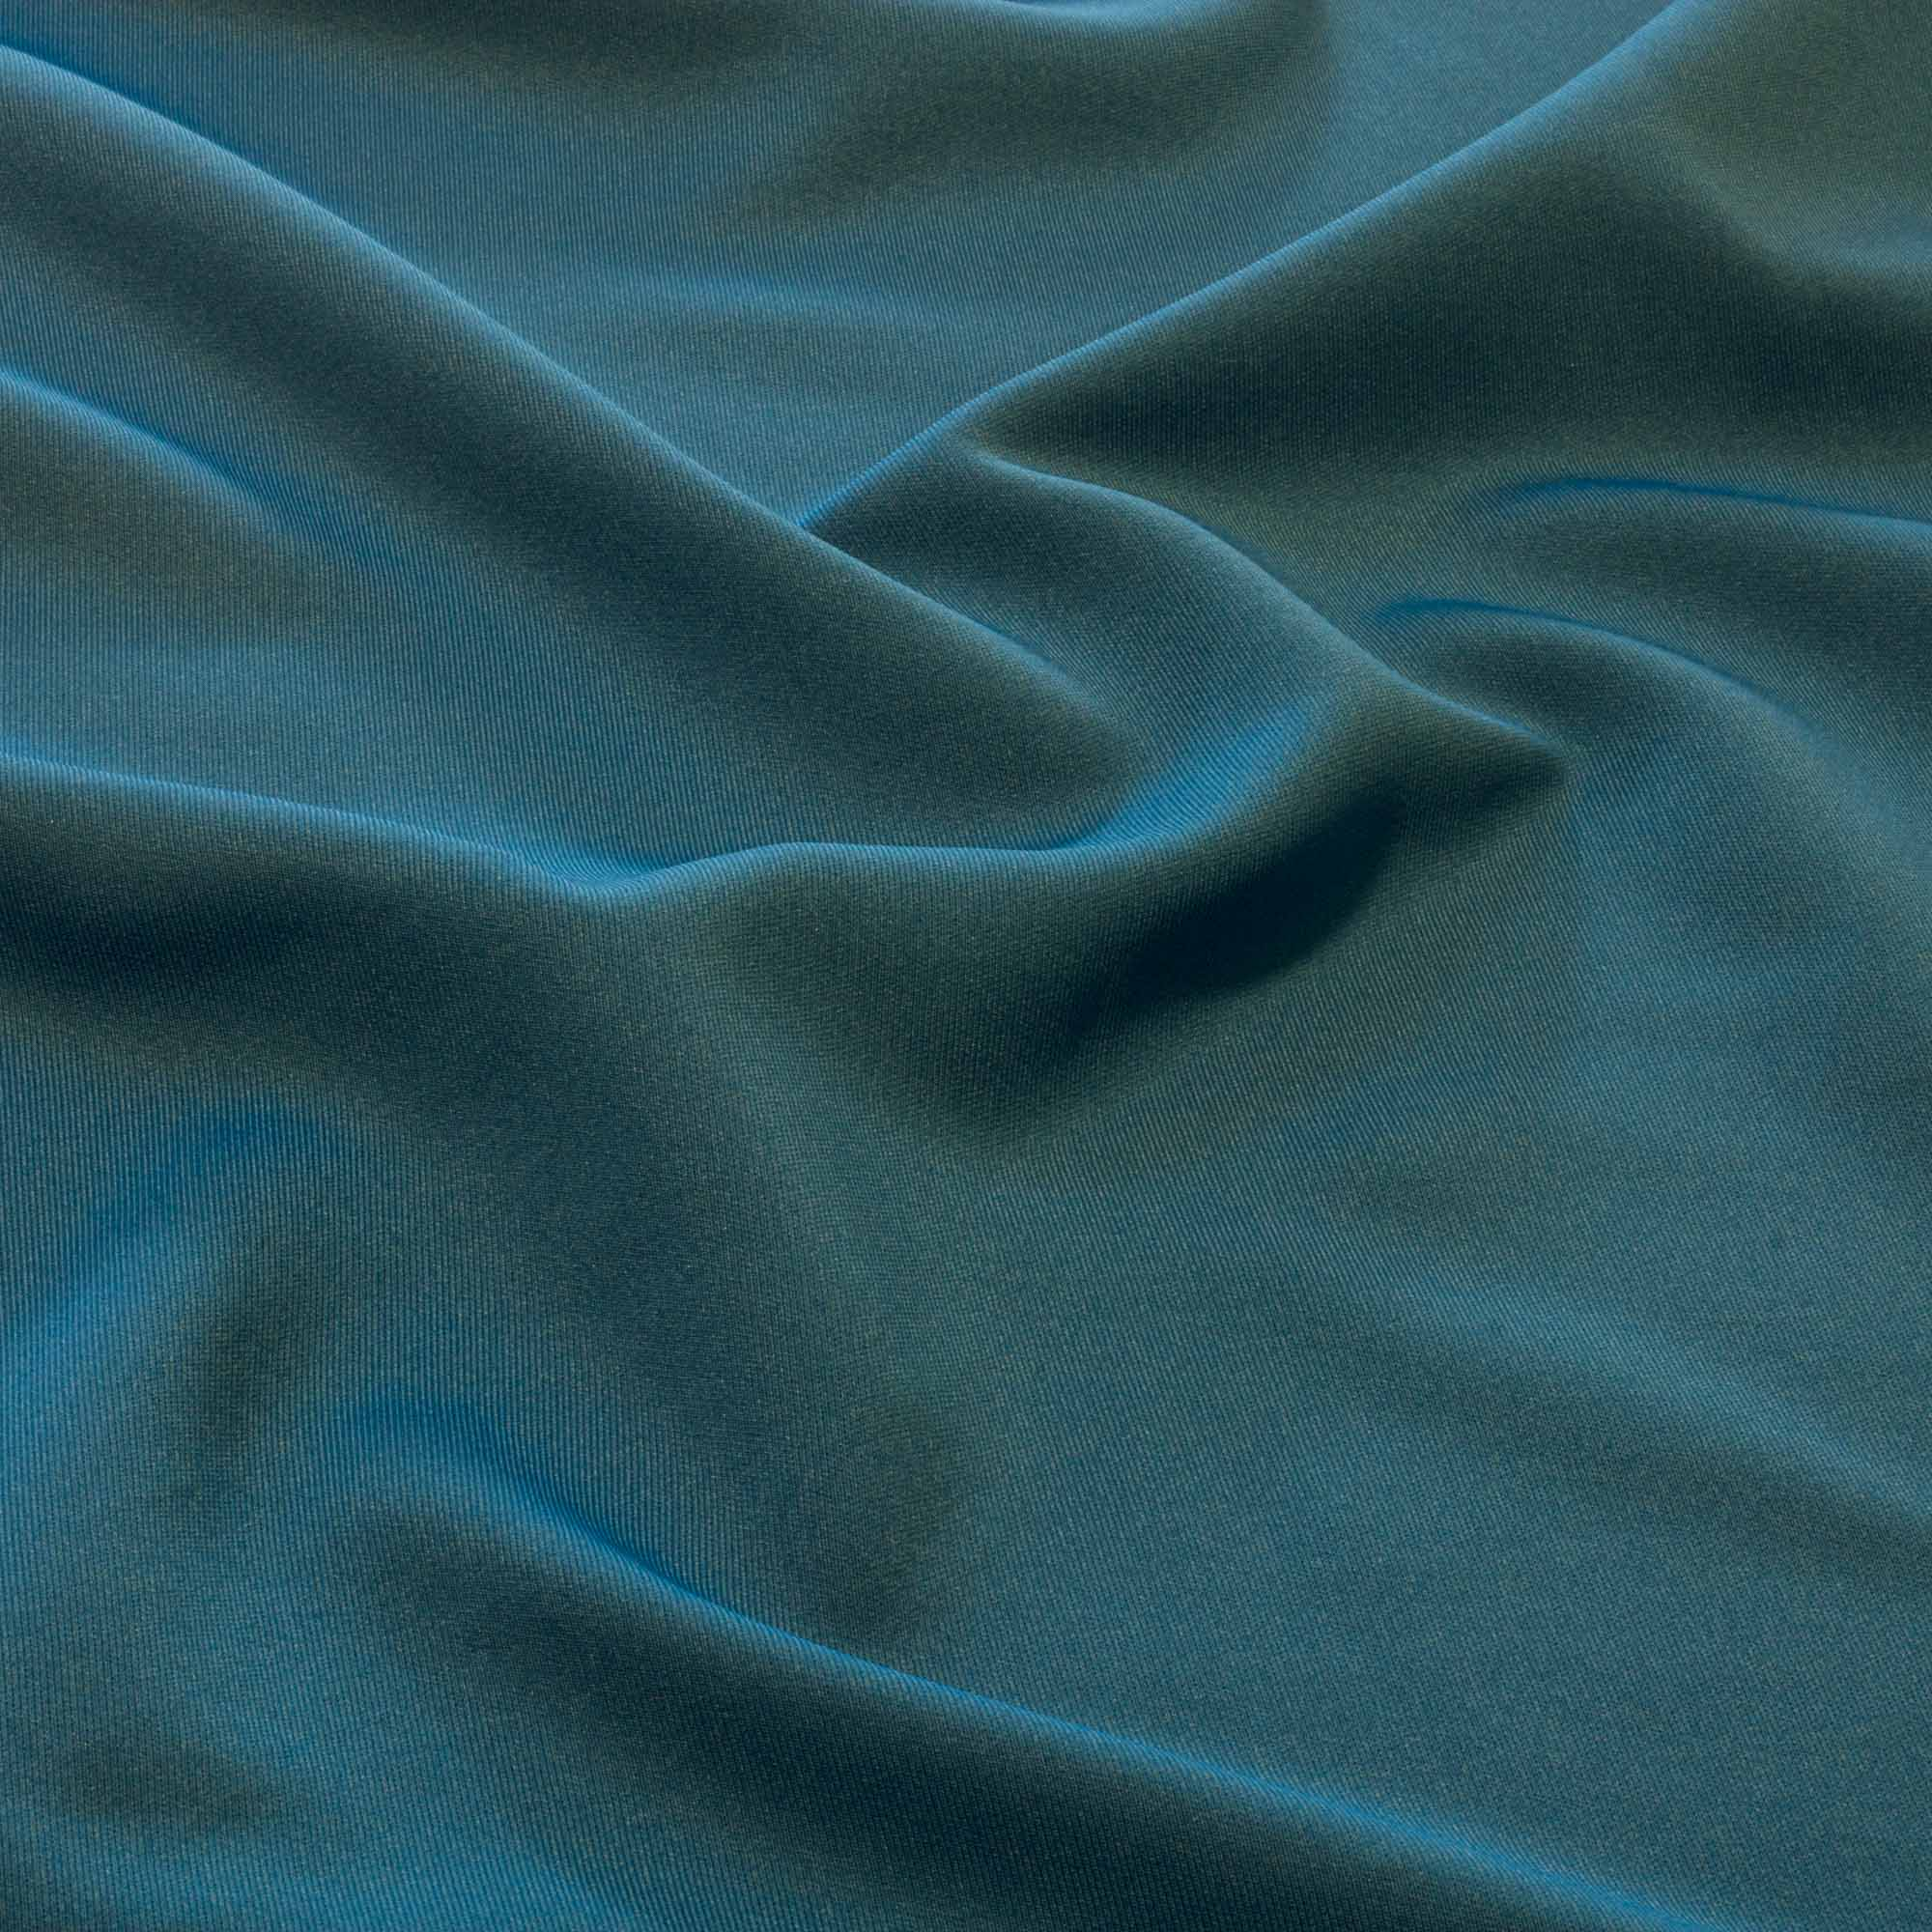 Tecido Malha Neoprene 95% Poliester 5% Elastano Azul